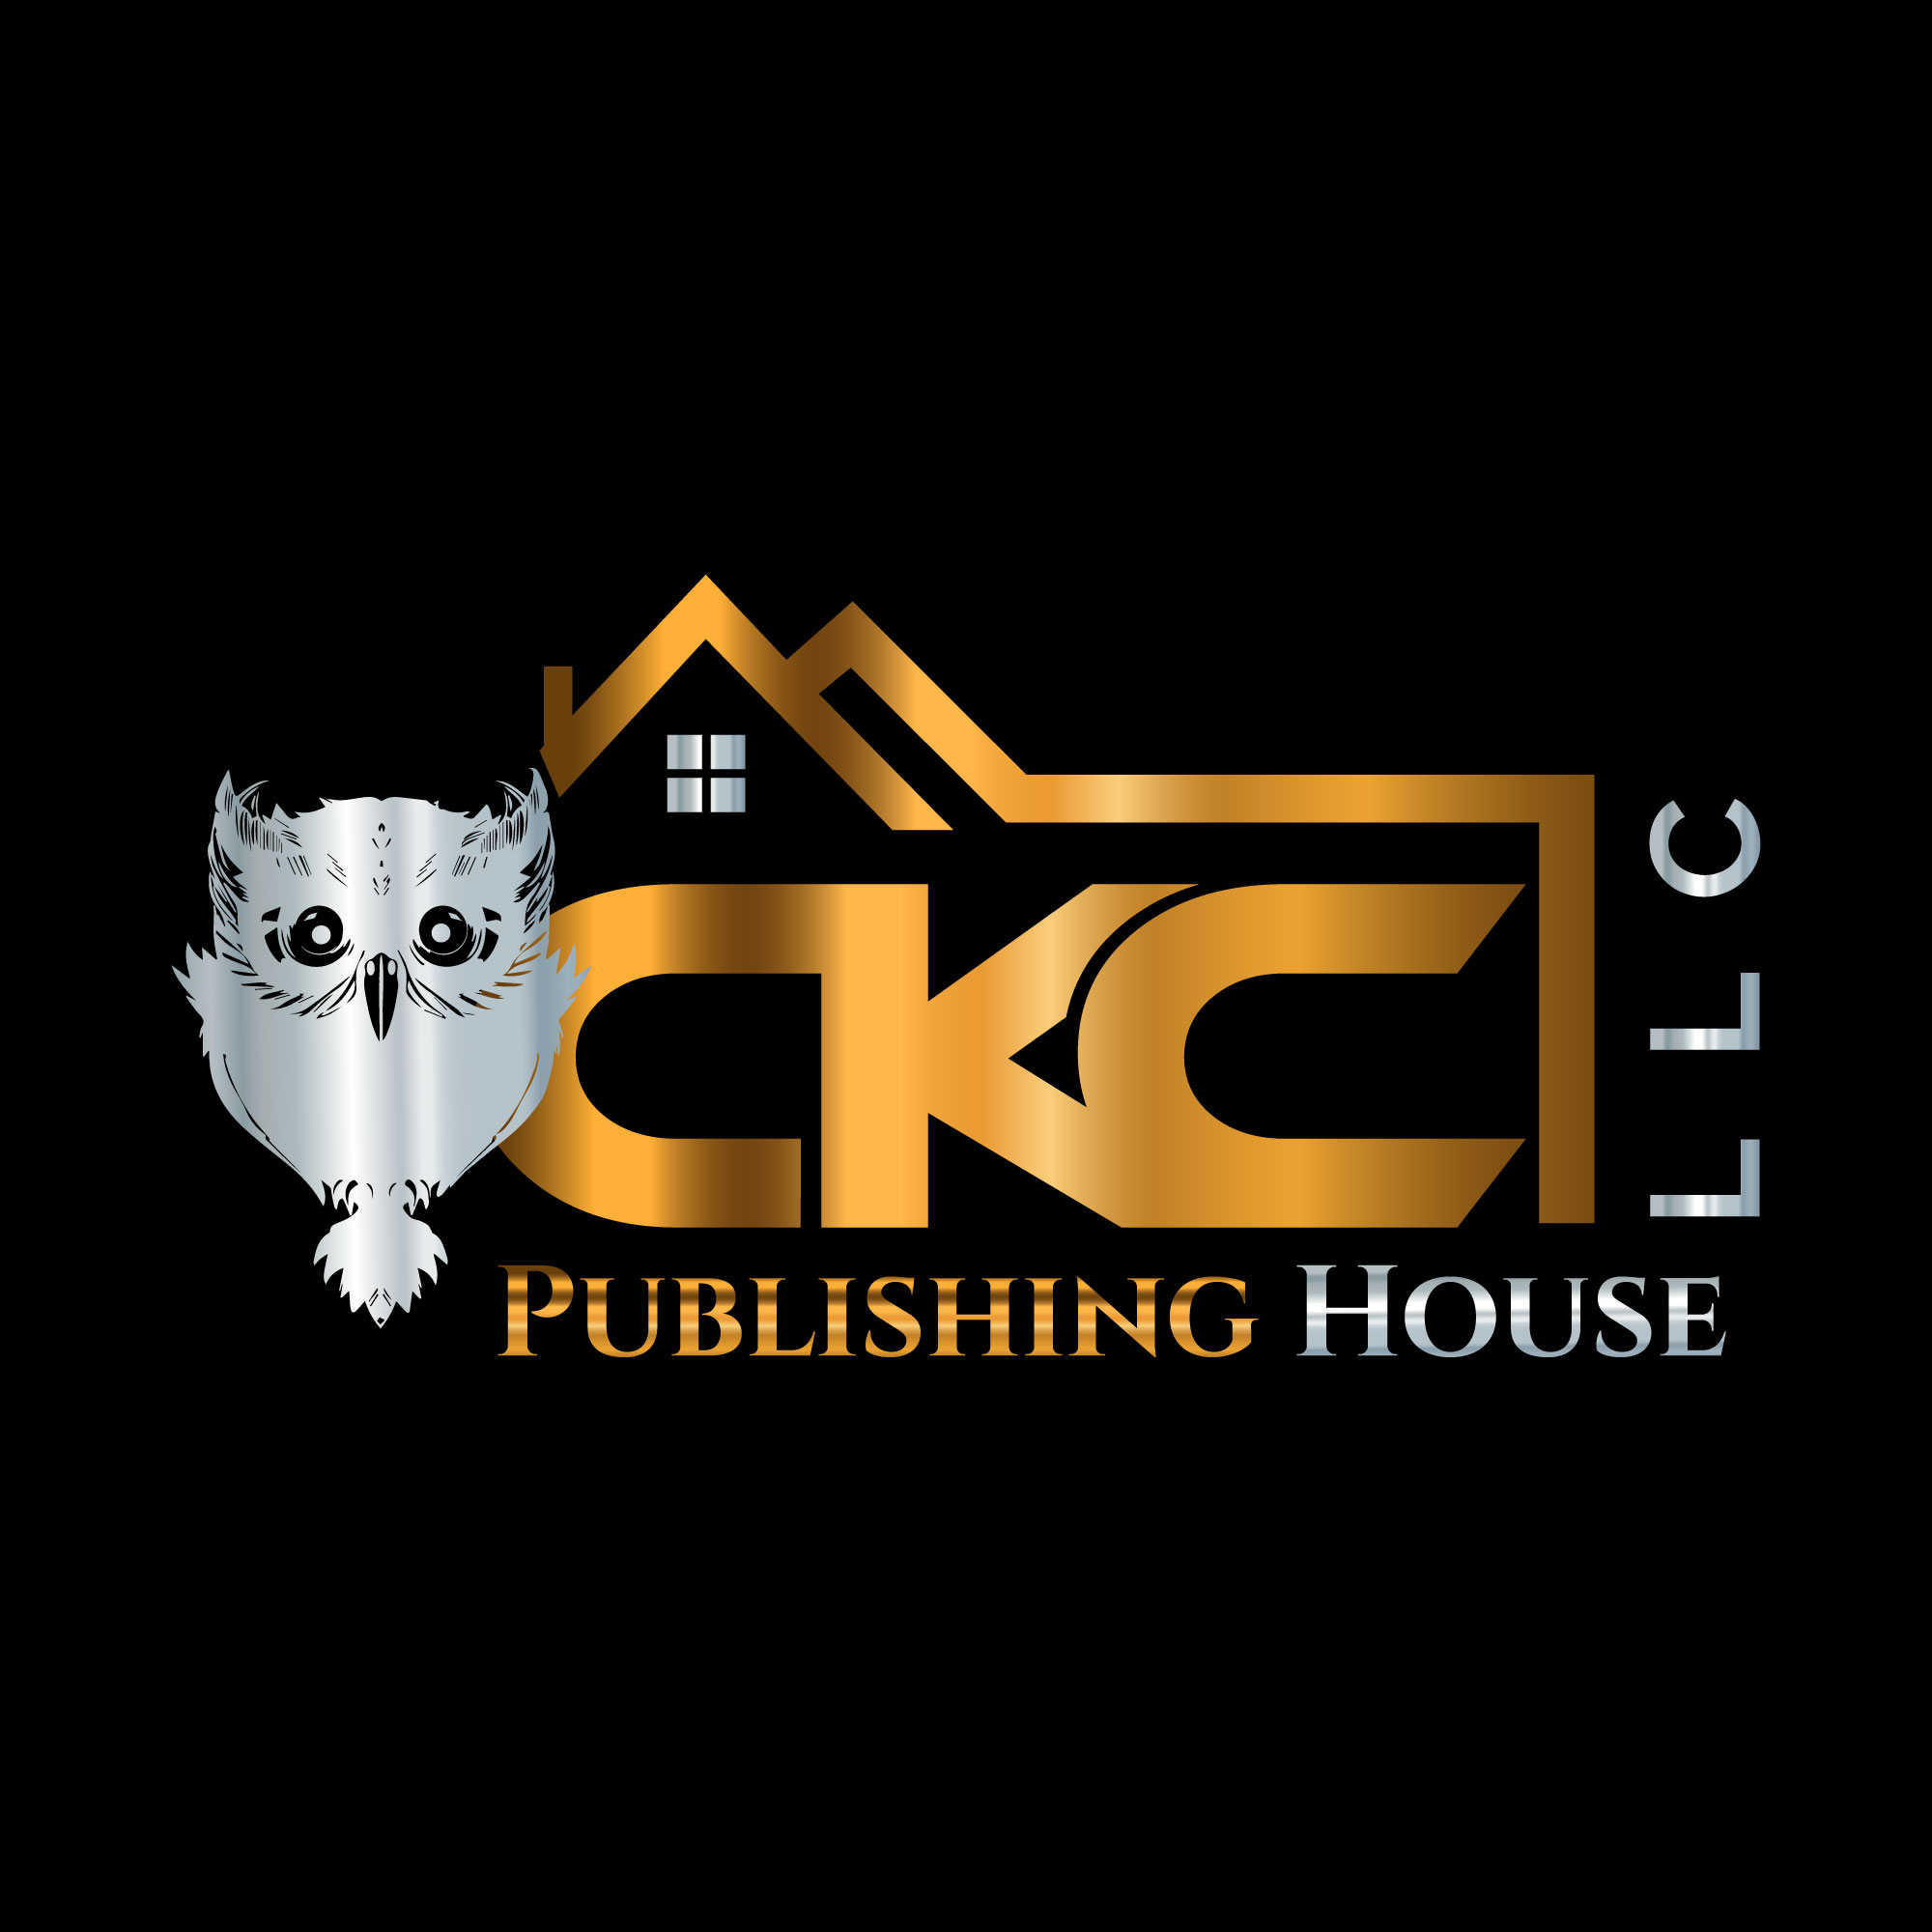 CKC Publishing House